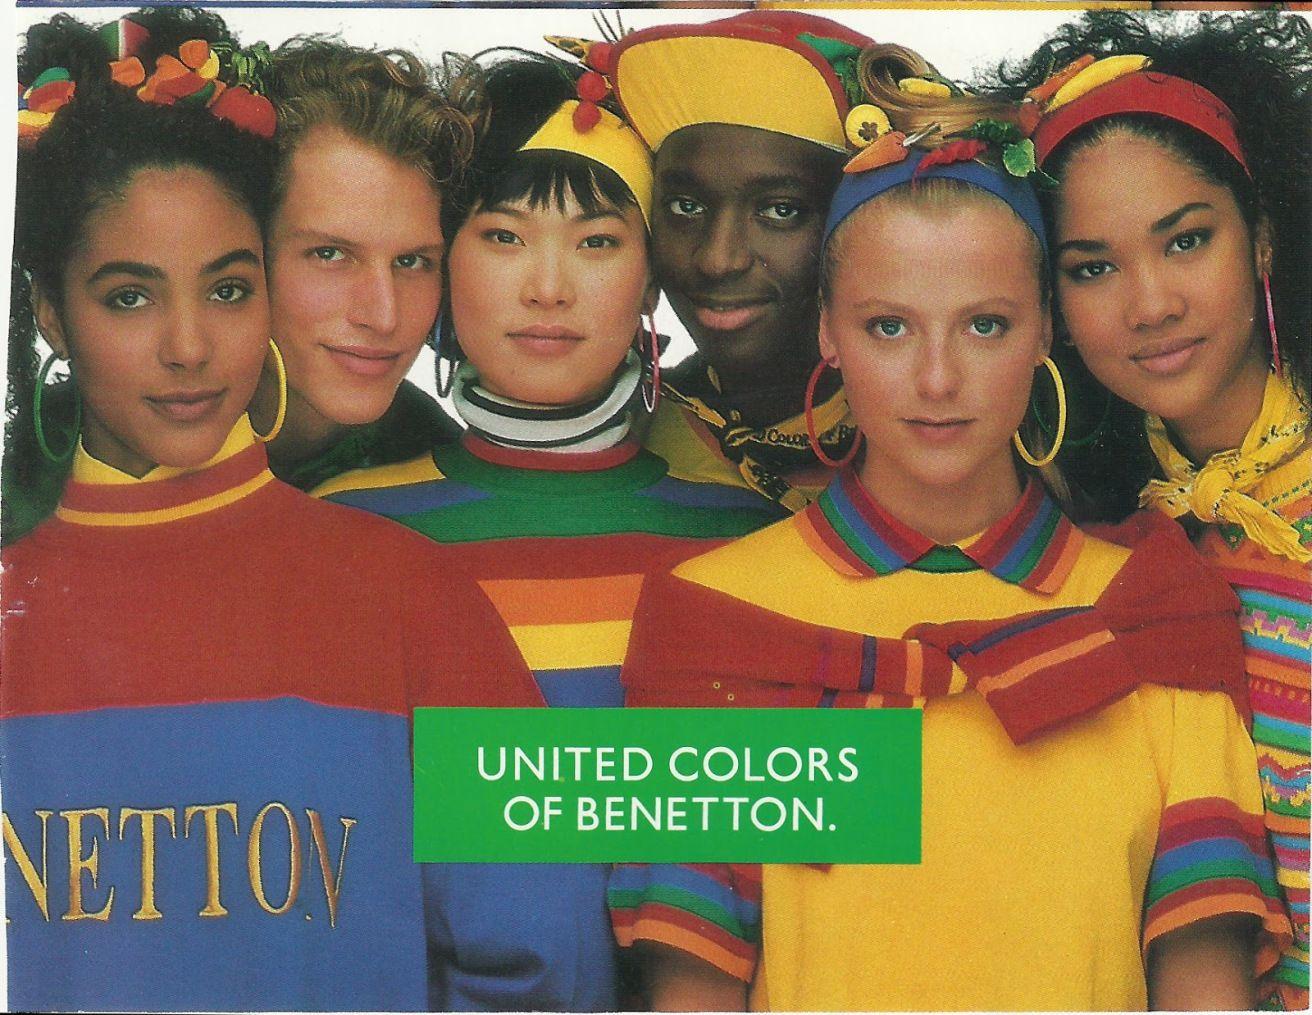 Benetton Predominantly Primary Color Scheme The Conceptual Nature Of This Color Scheme Lends